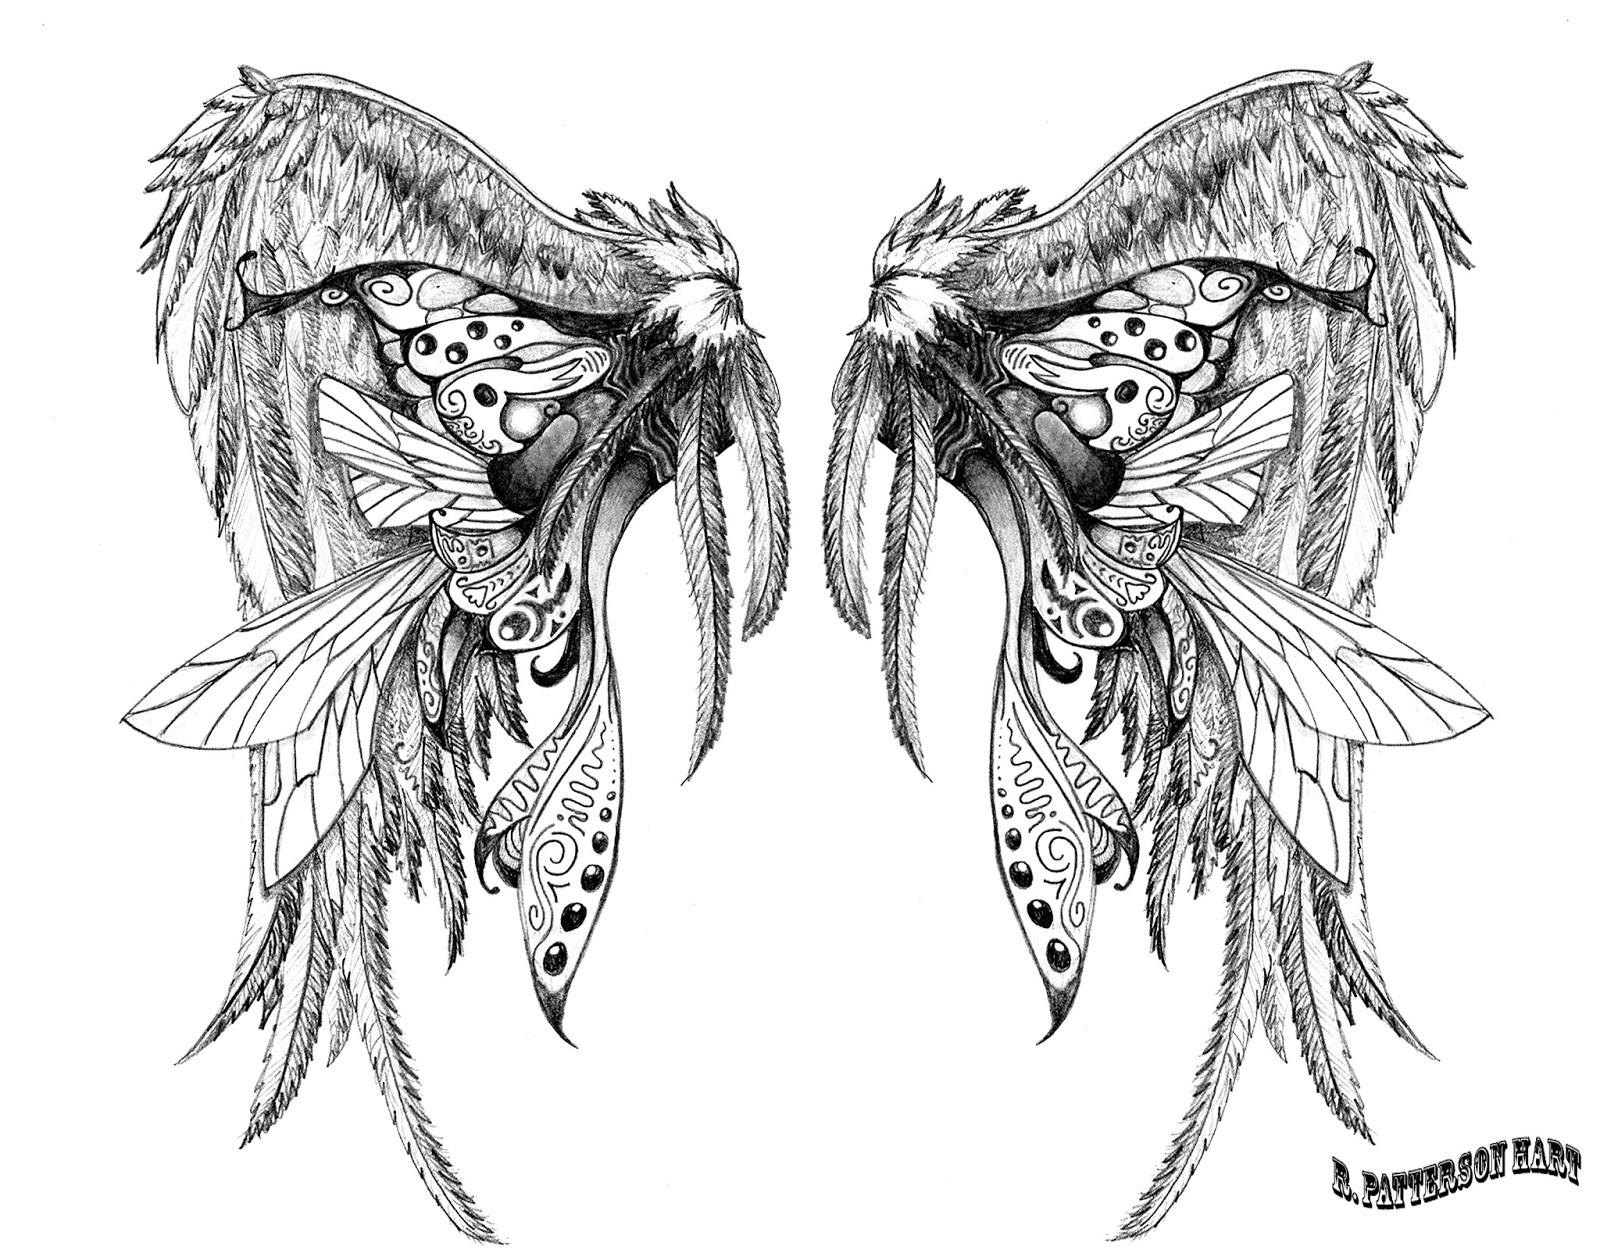 White Angel Wings Tattoos: 15 Tattoos Designs Sleeves For Men